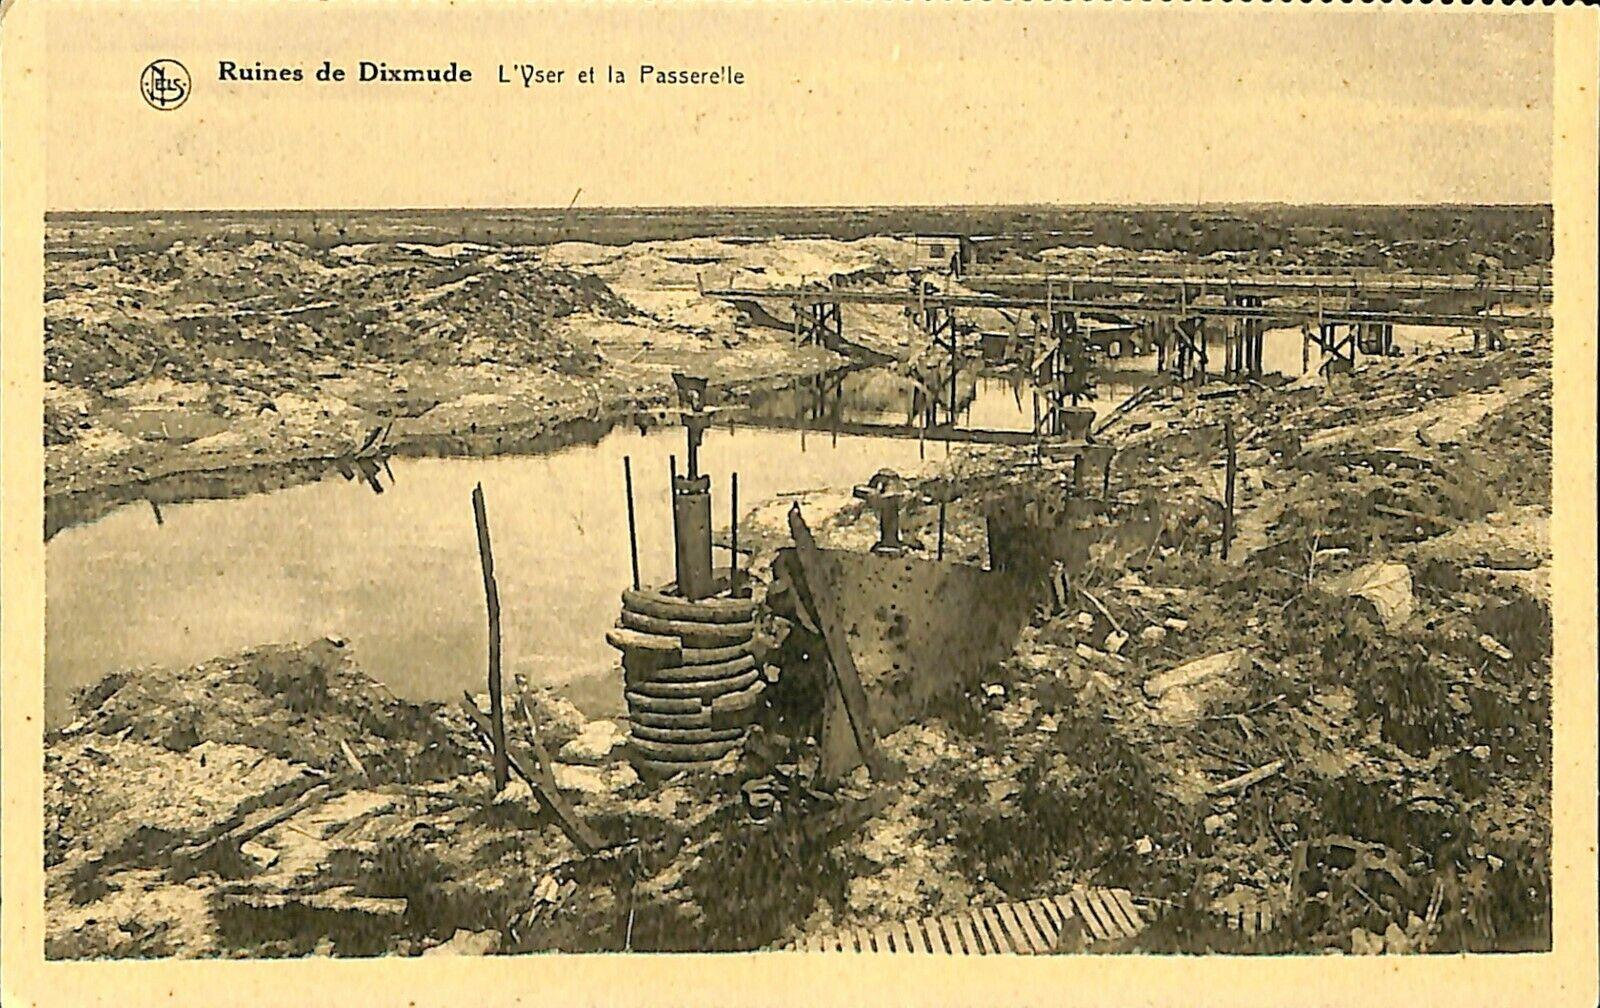 CPA - Belgique - Diksmuide - Dixmude - L'Yser et la Passerelle